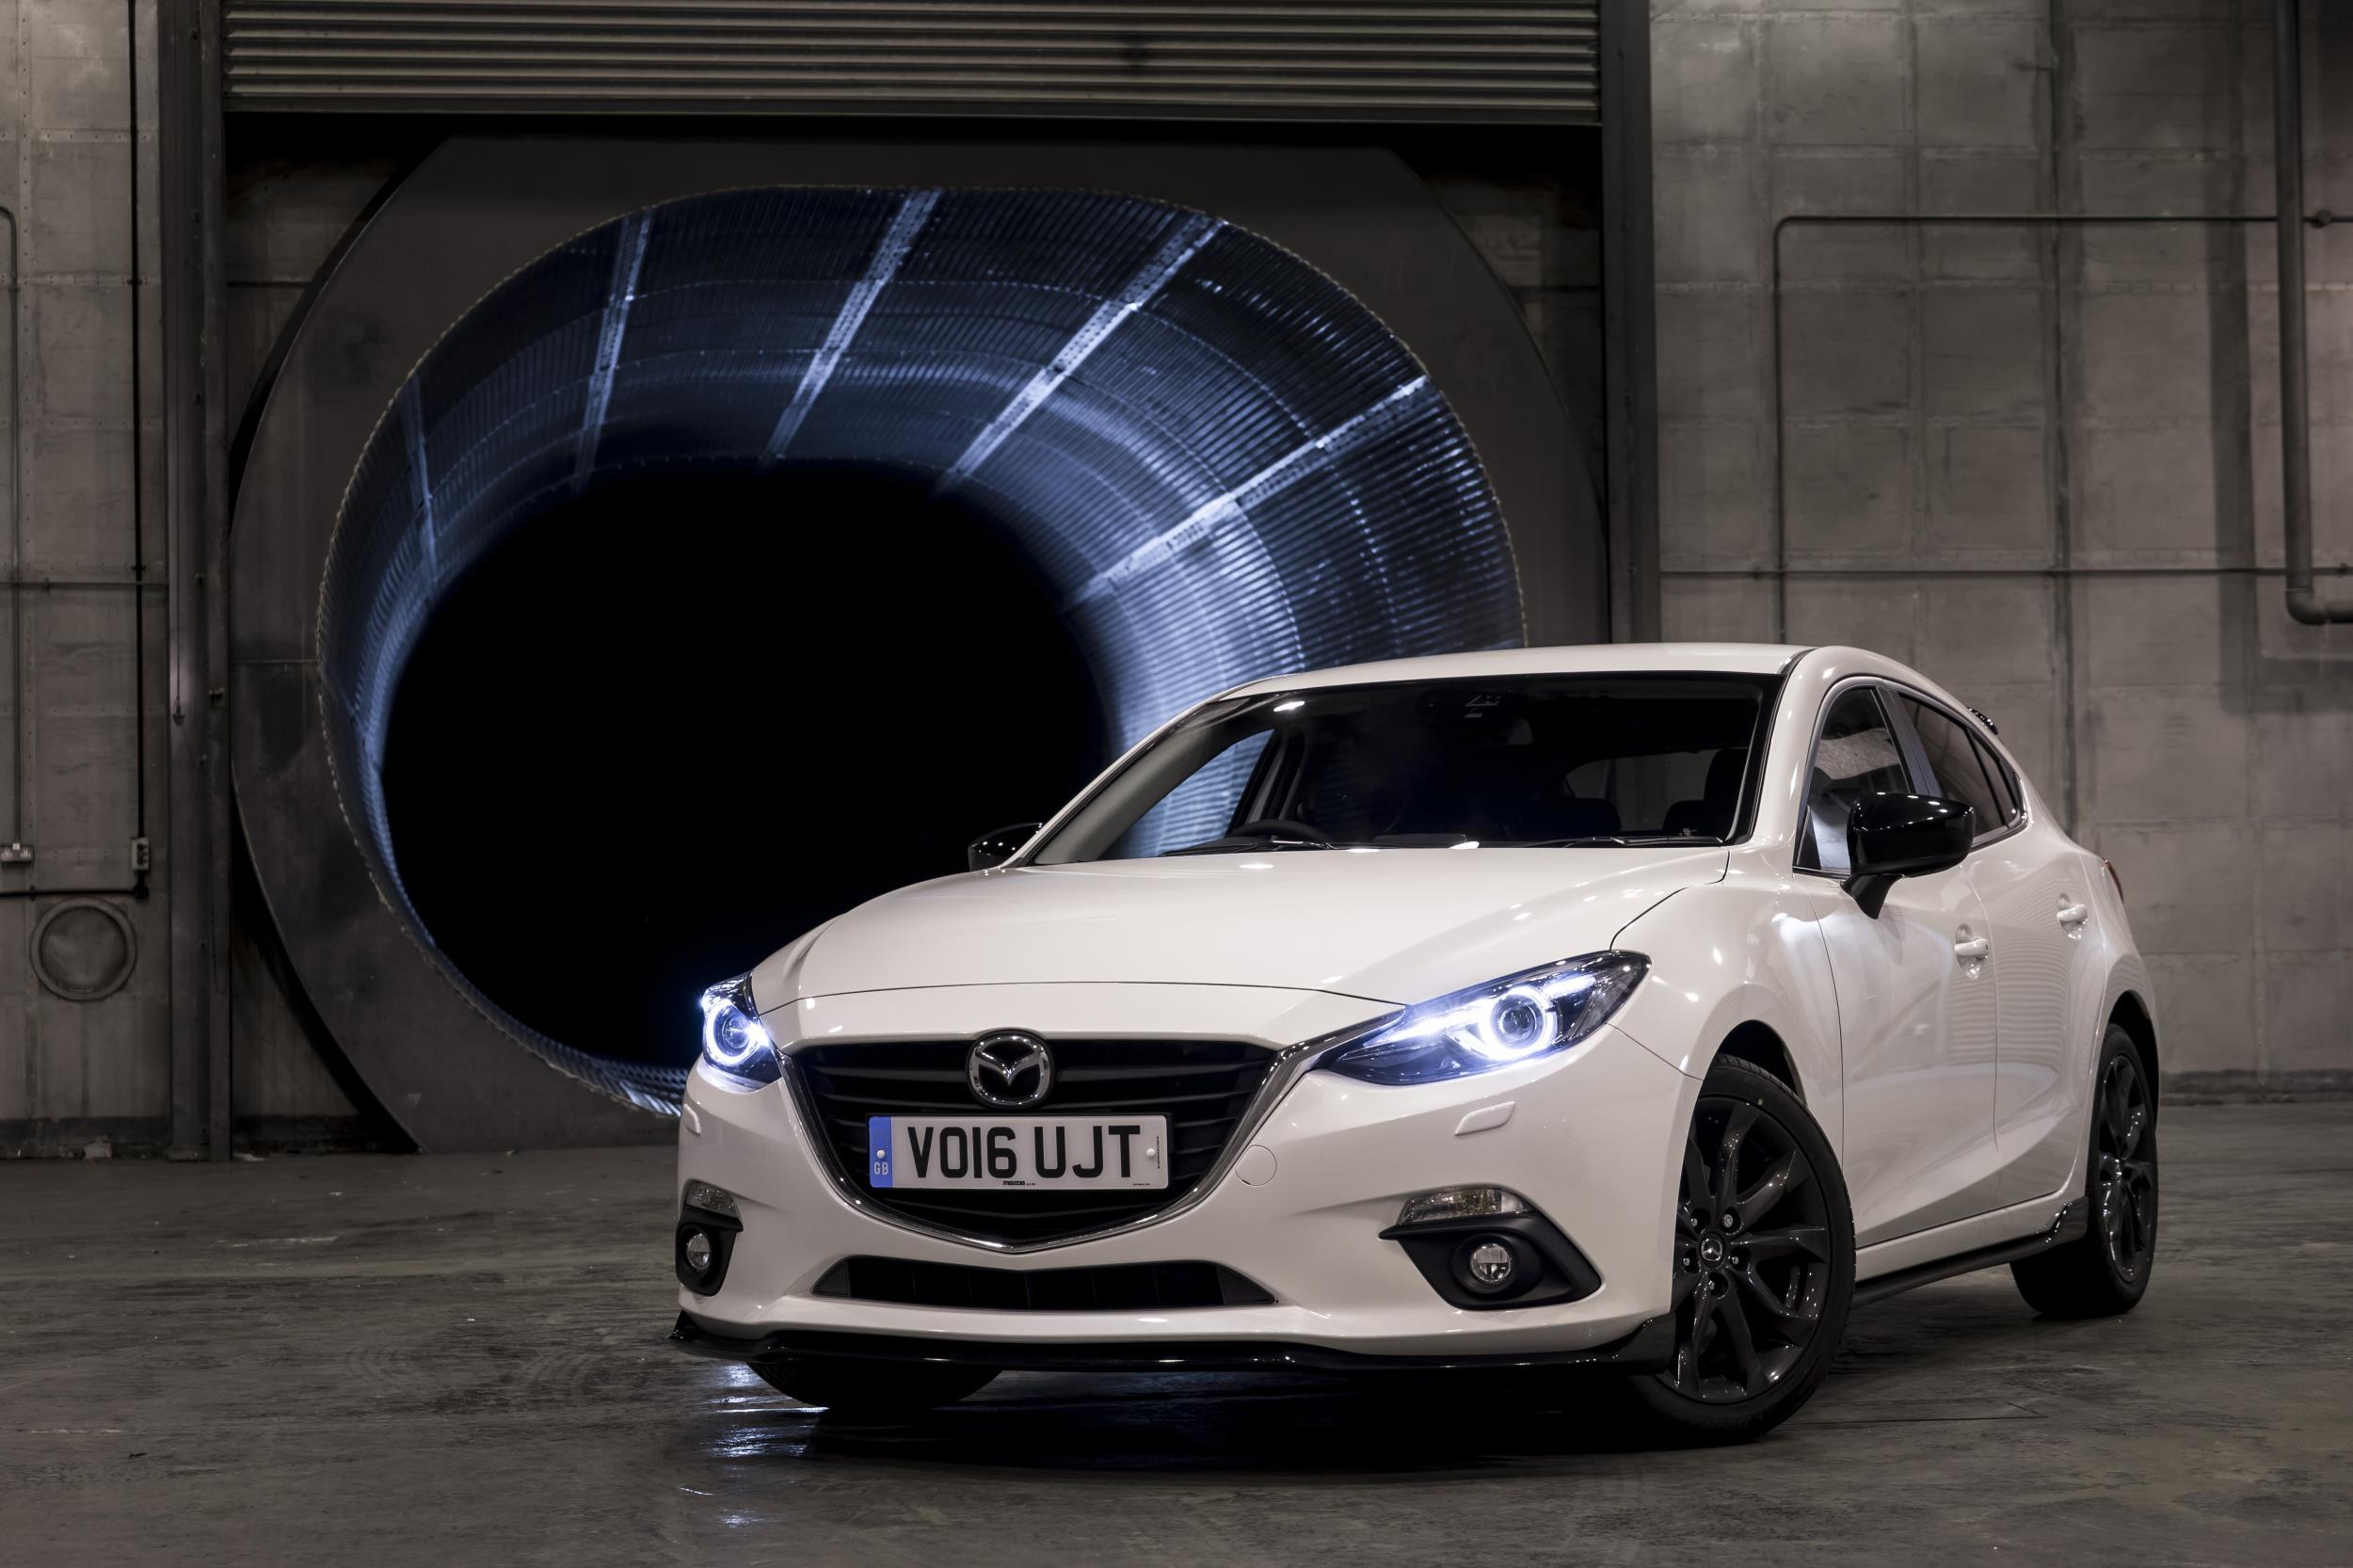 Mazda 3 Axela 2017 >> Mazda3 Sport Black Special Edition Goes on Sale with Body Kit, 120 HP Engine - autoevolution